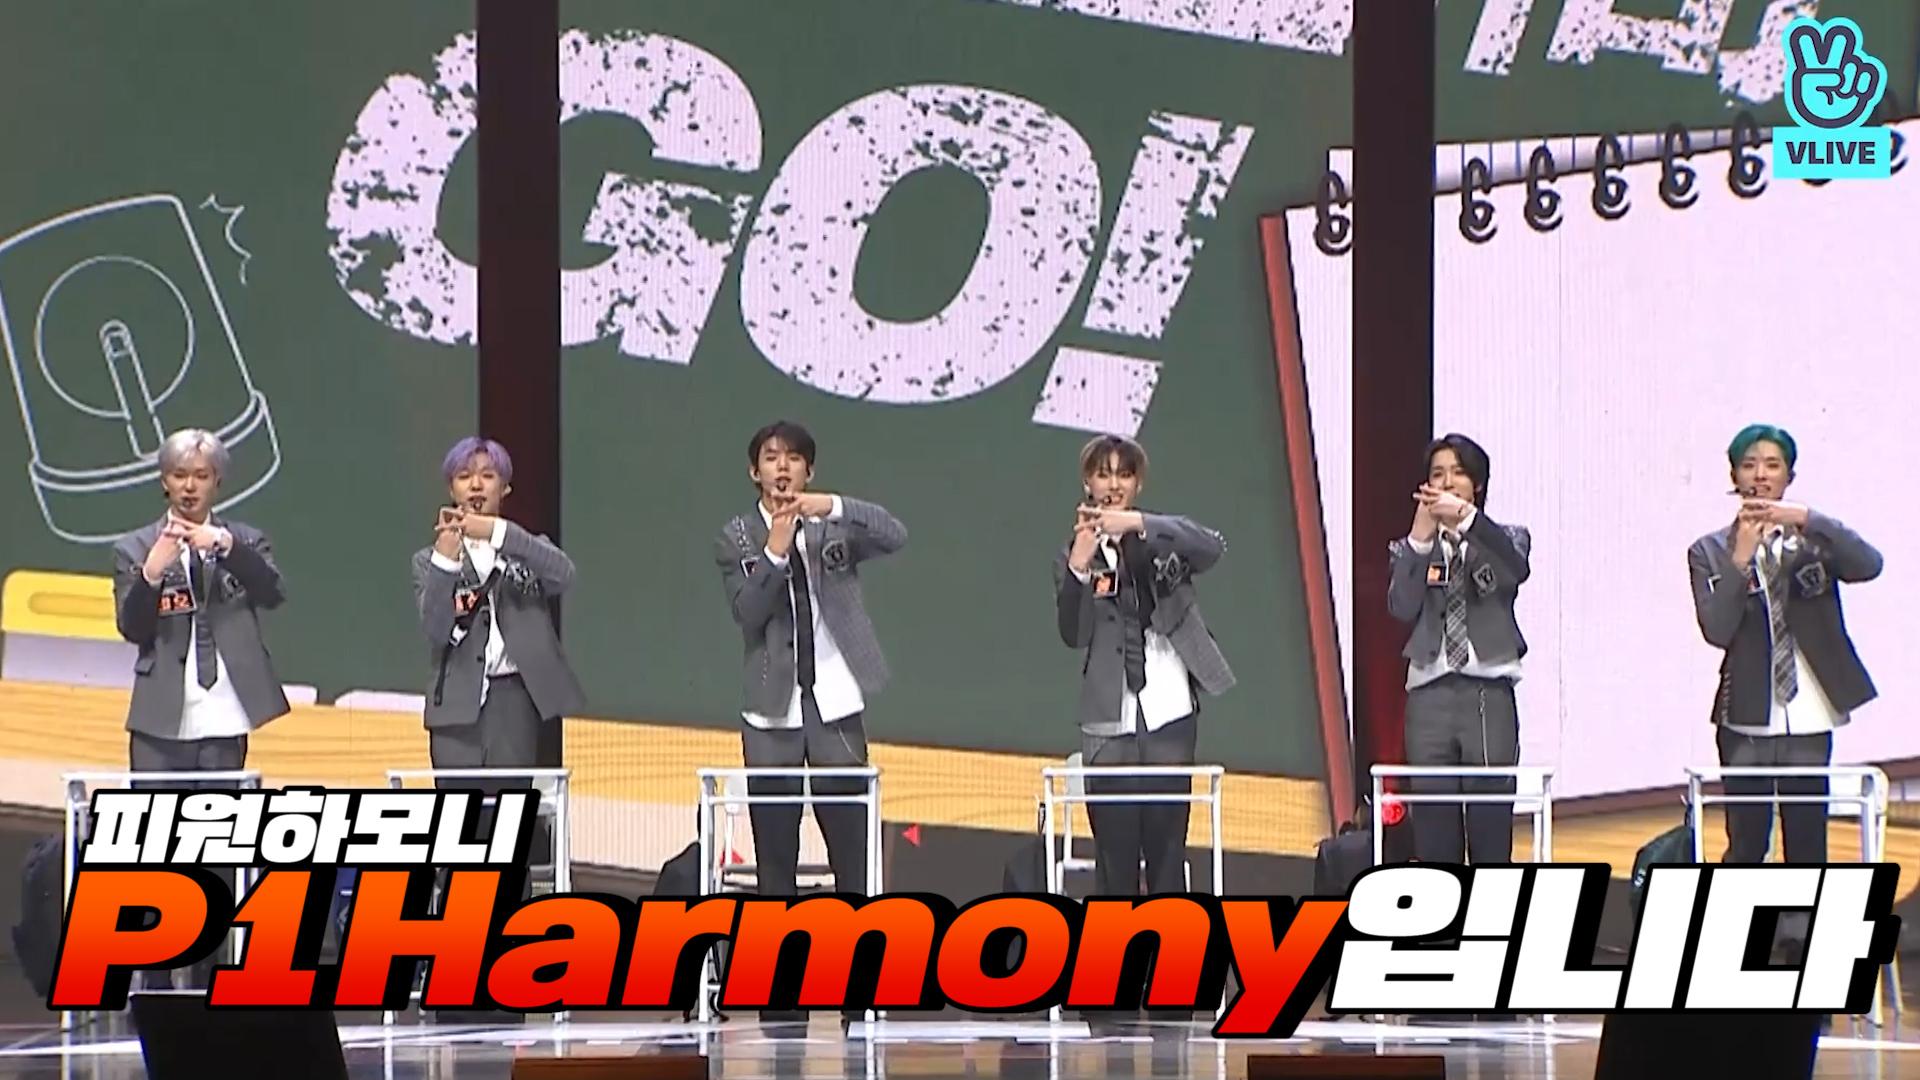 [P1Harmony] 🚨위옹위옹 피원하모니 귀엽다고 삐삐 울려대🚨 (P1Harmony's self-introduction!)